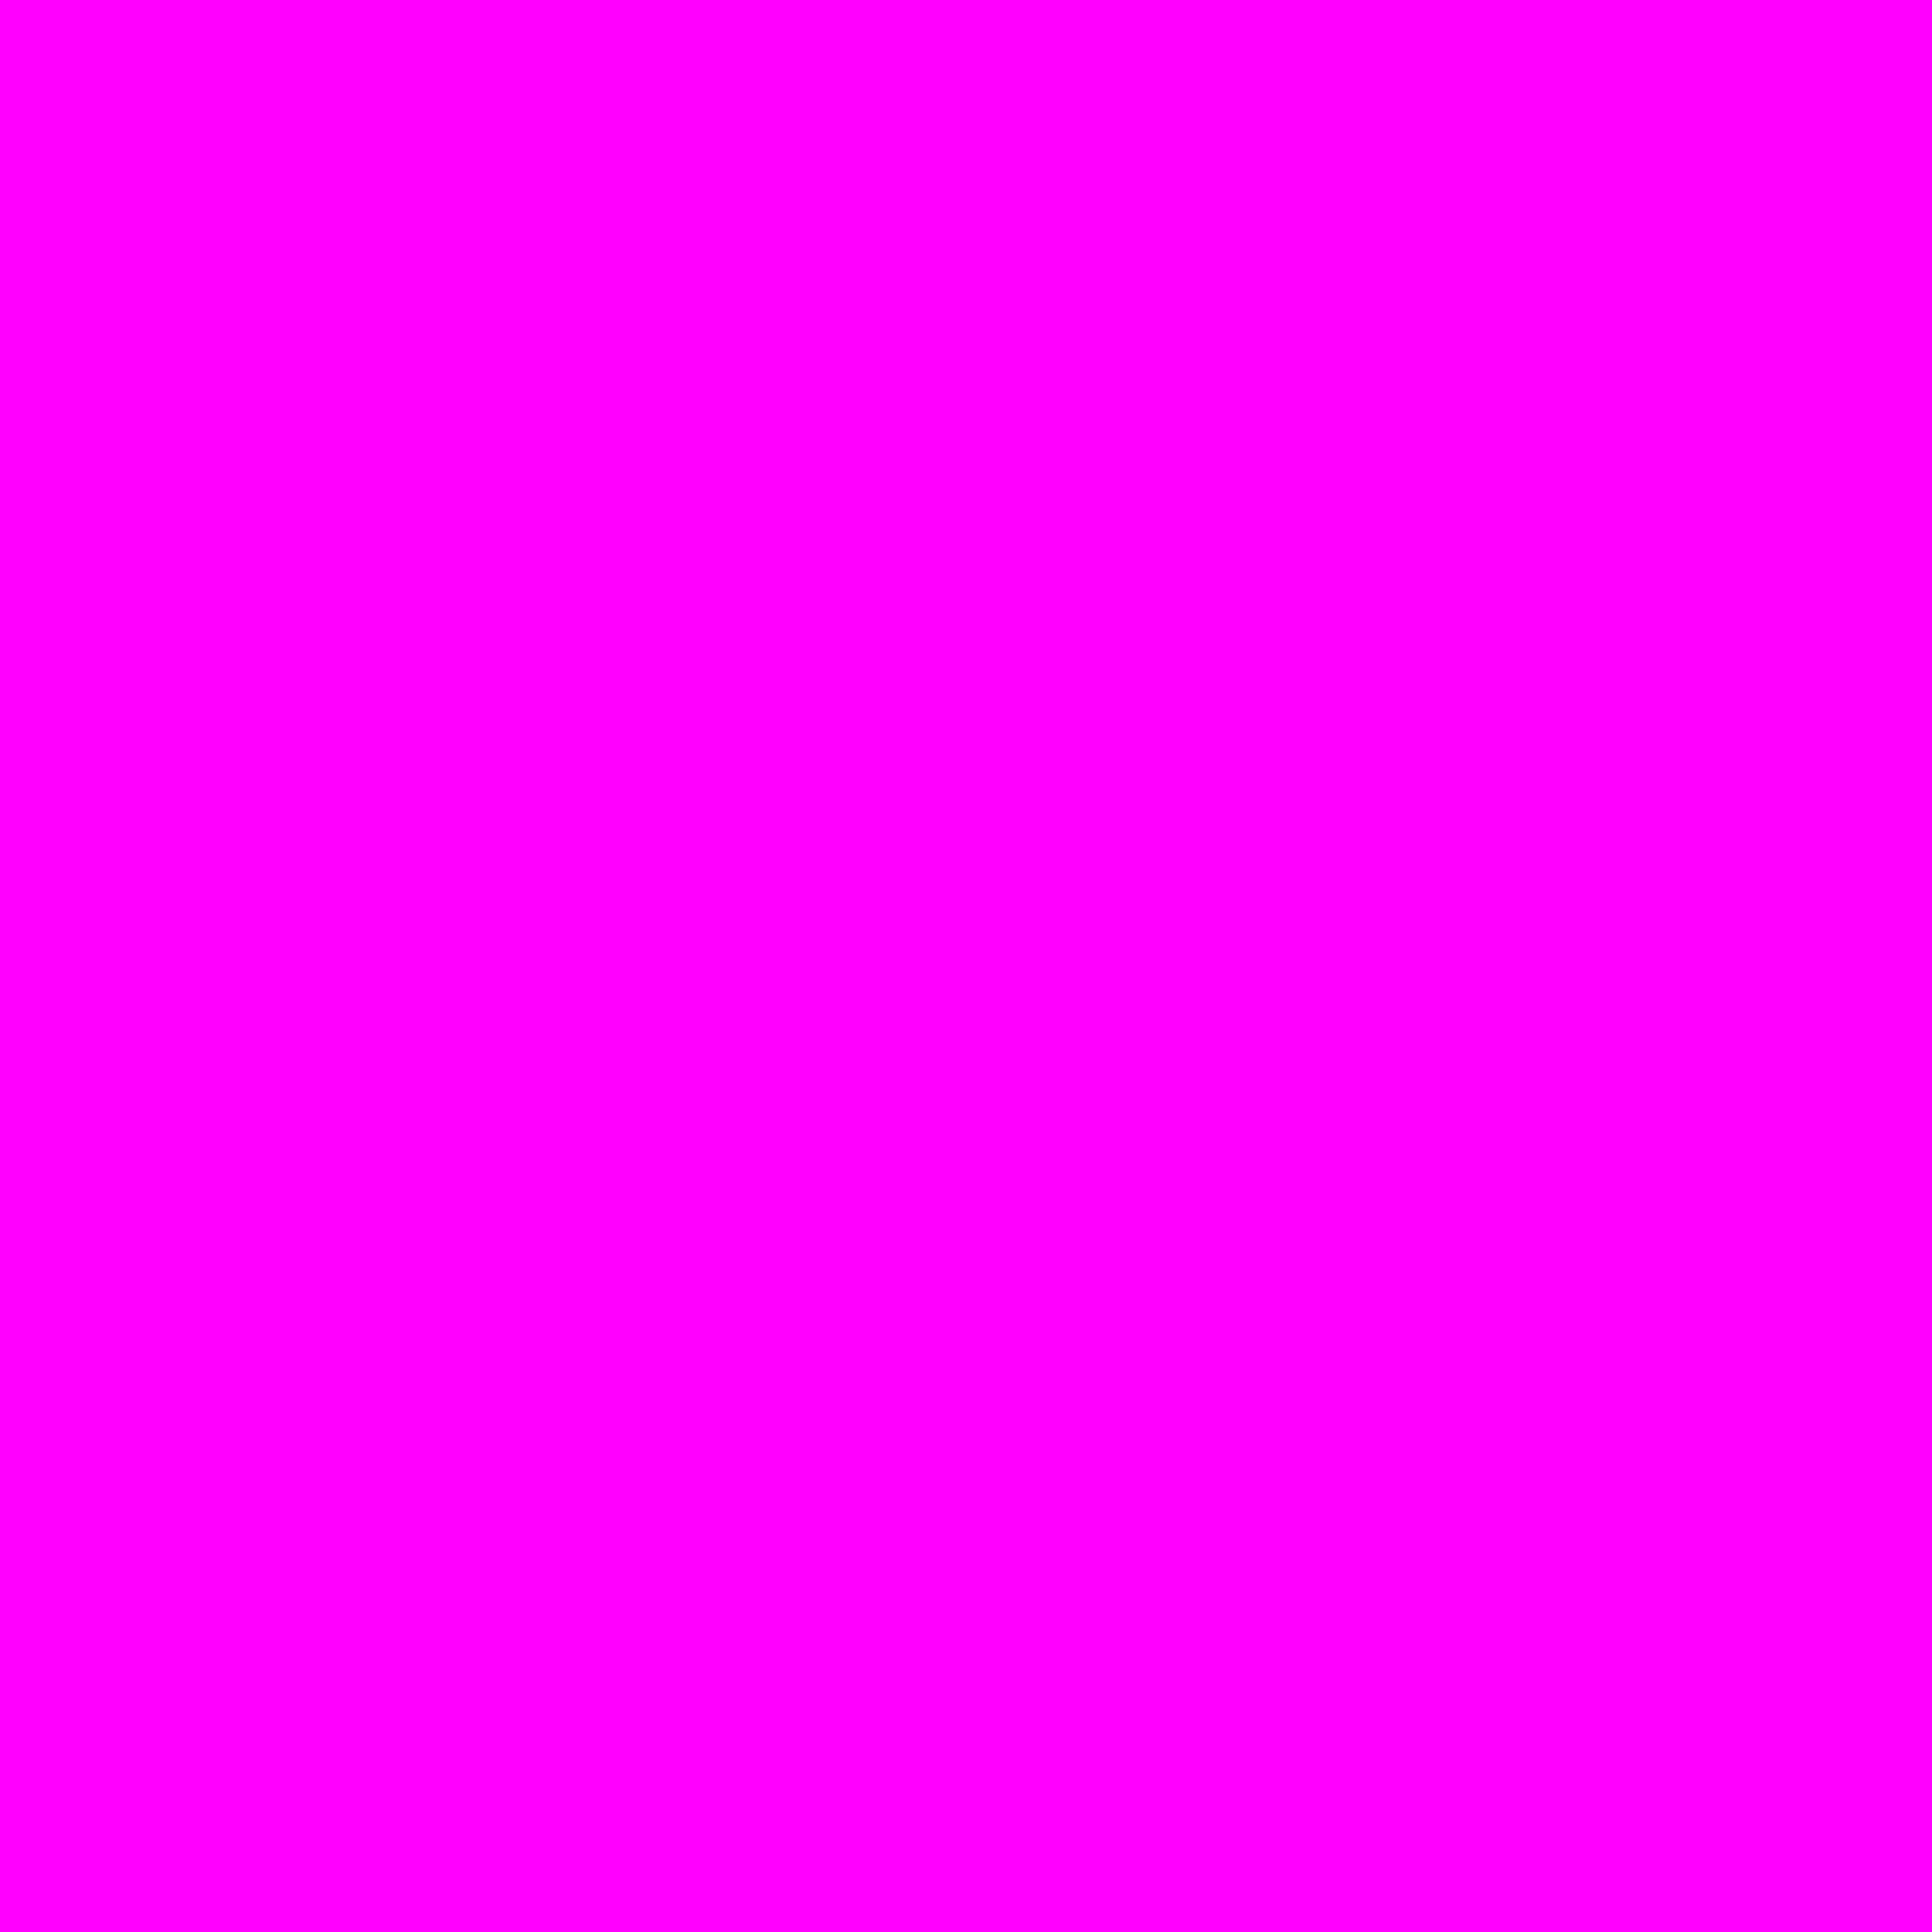 3600x3600 Magenta Solid Color Background